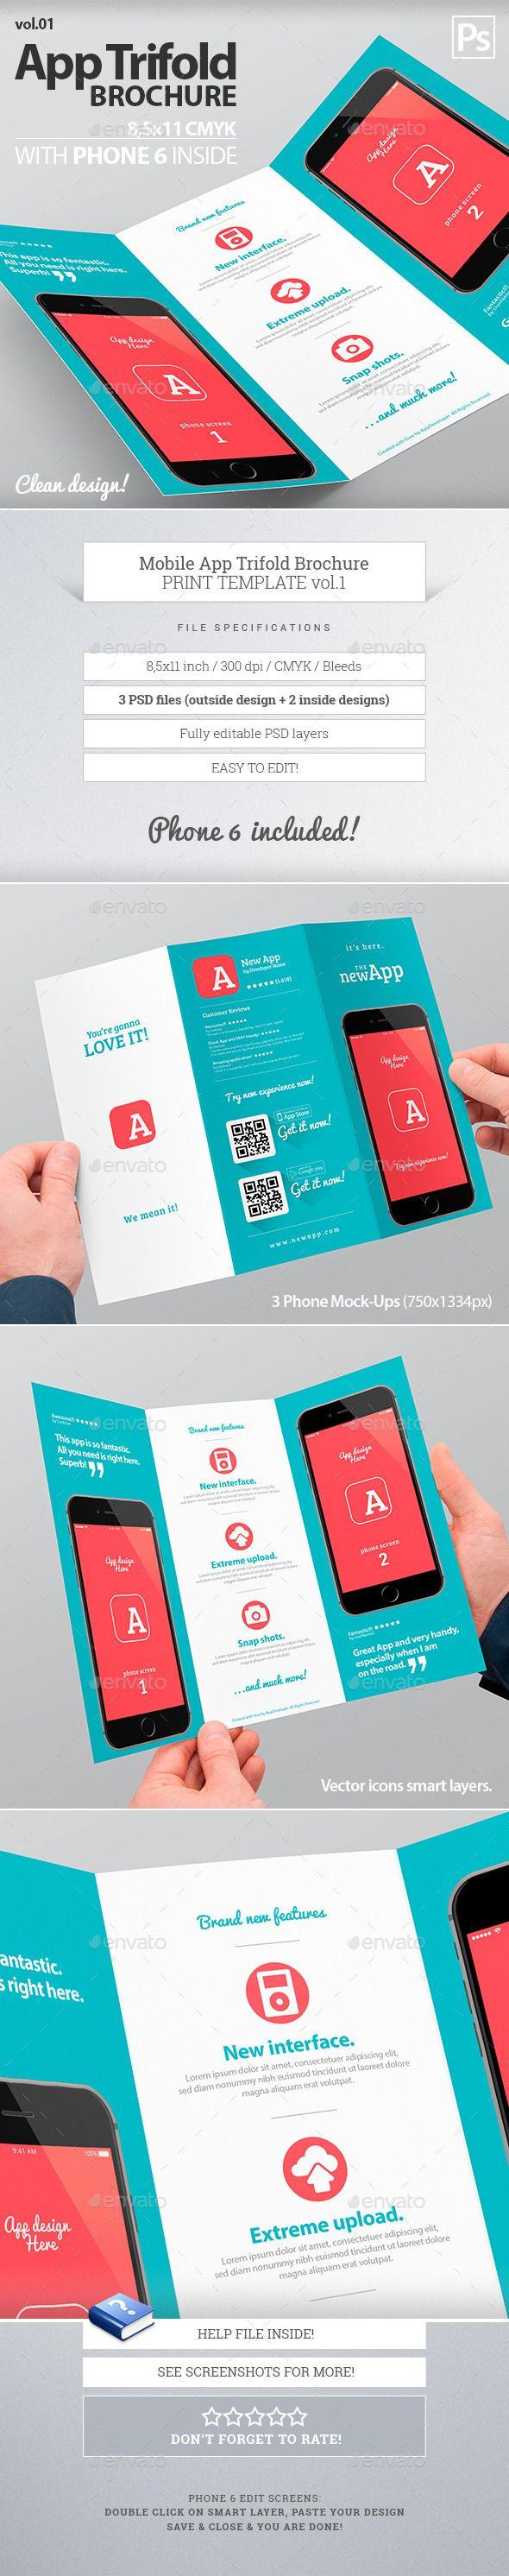 Mobile App Trifold Brochure Template #design Download: http://graphicriver.net/item/mobile-app-trifold-brochure-vol1/10158859?ref=ksioks